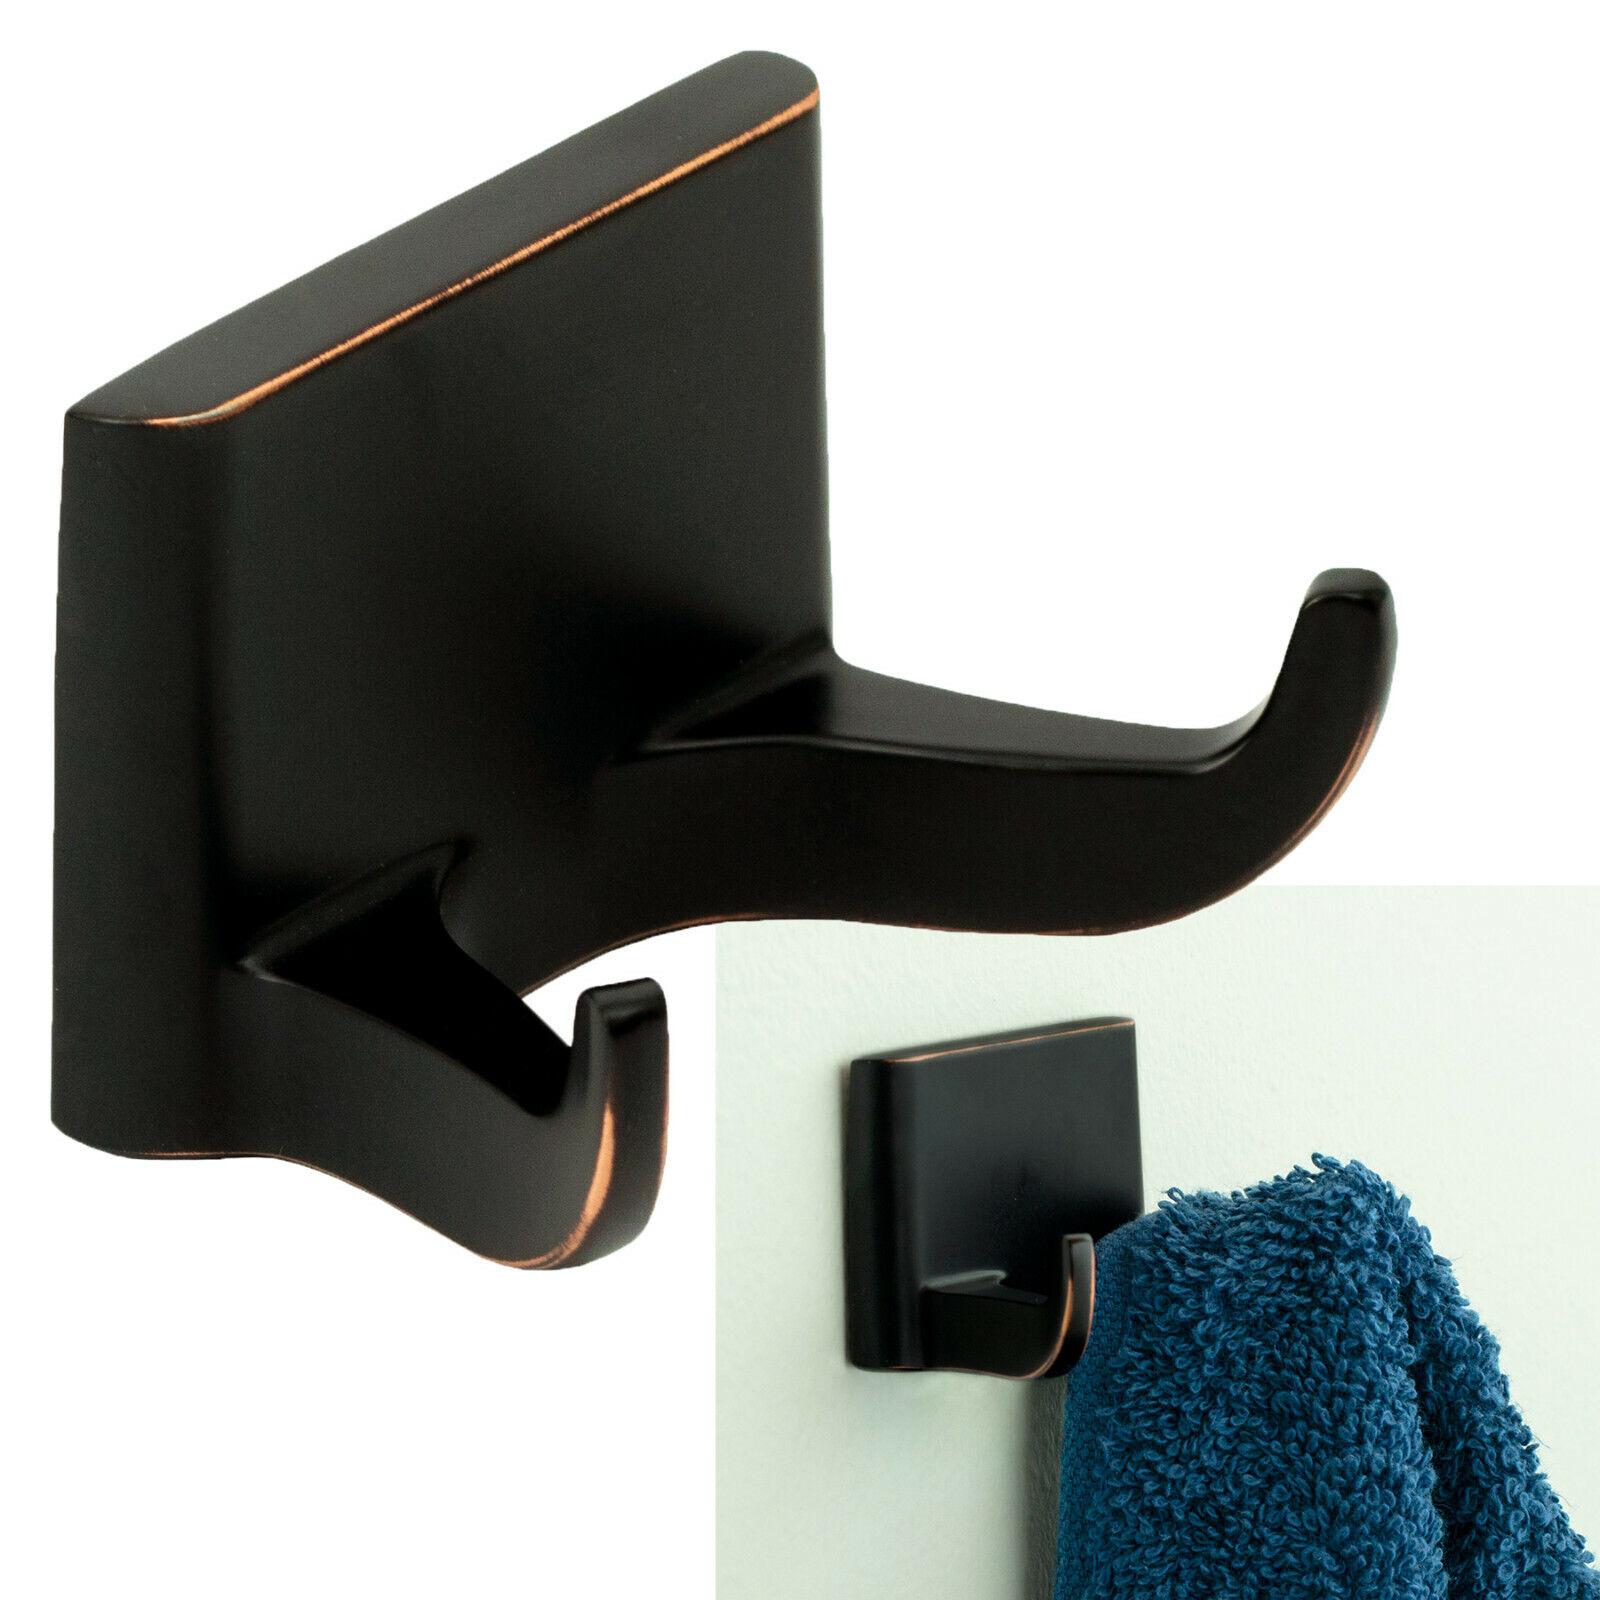 Redwood Double Robe Hook Bath Hardware Bathroom Accessory, Oil Rubbed Bronze Bath